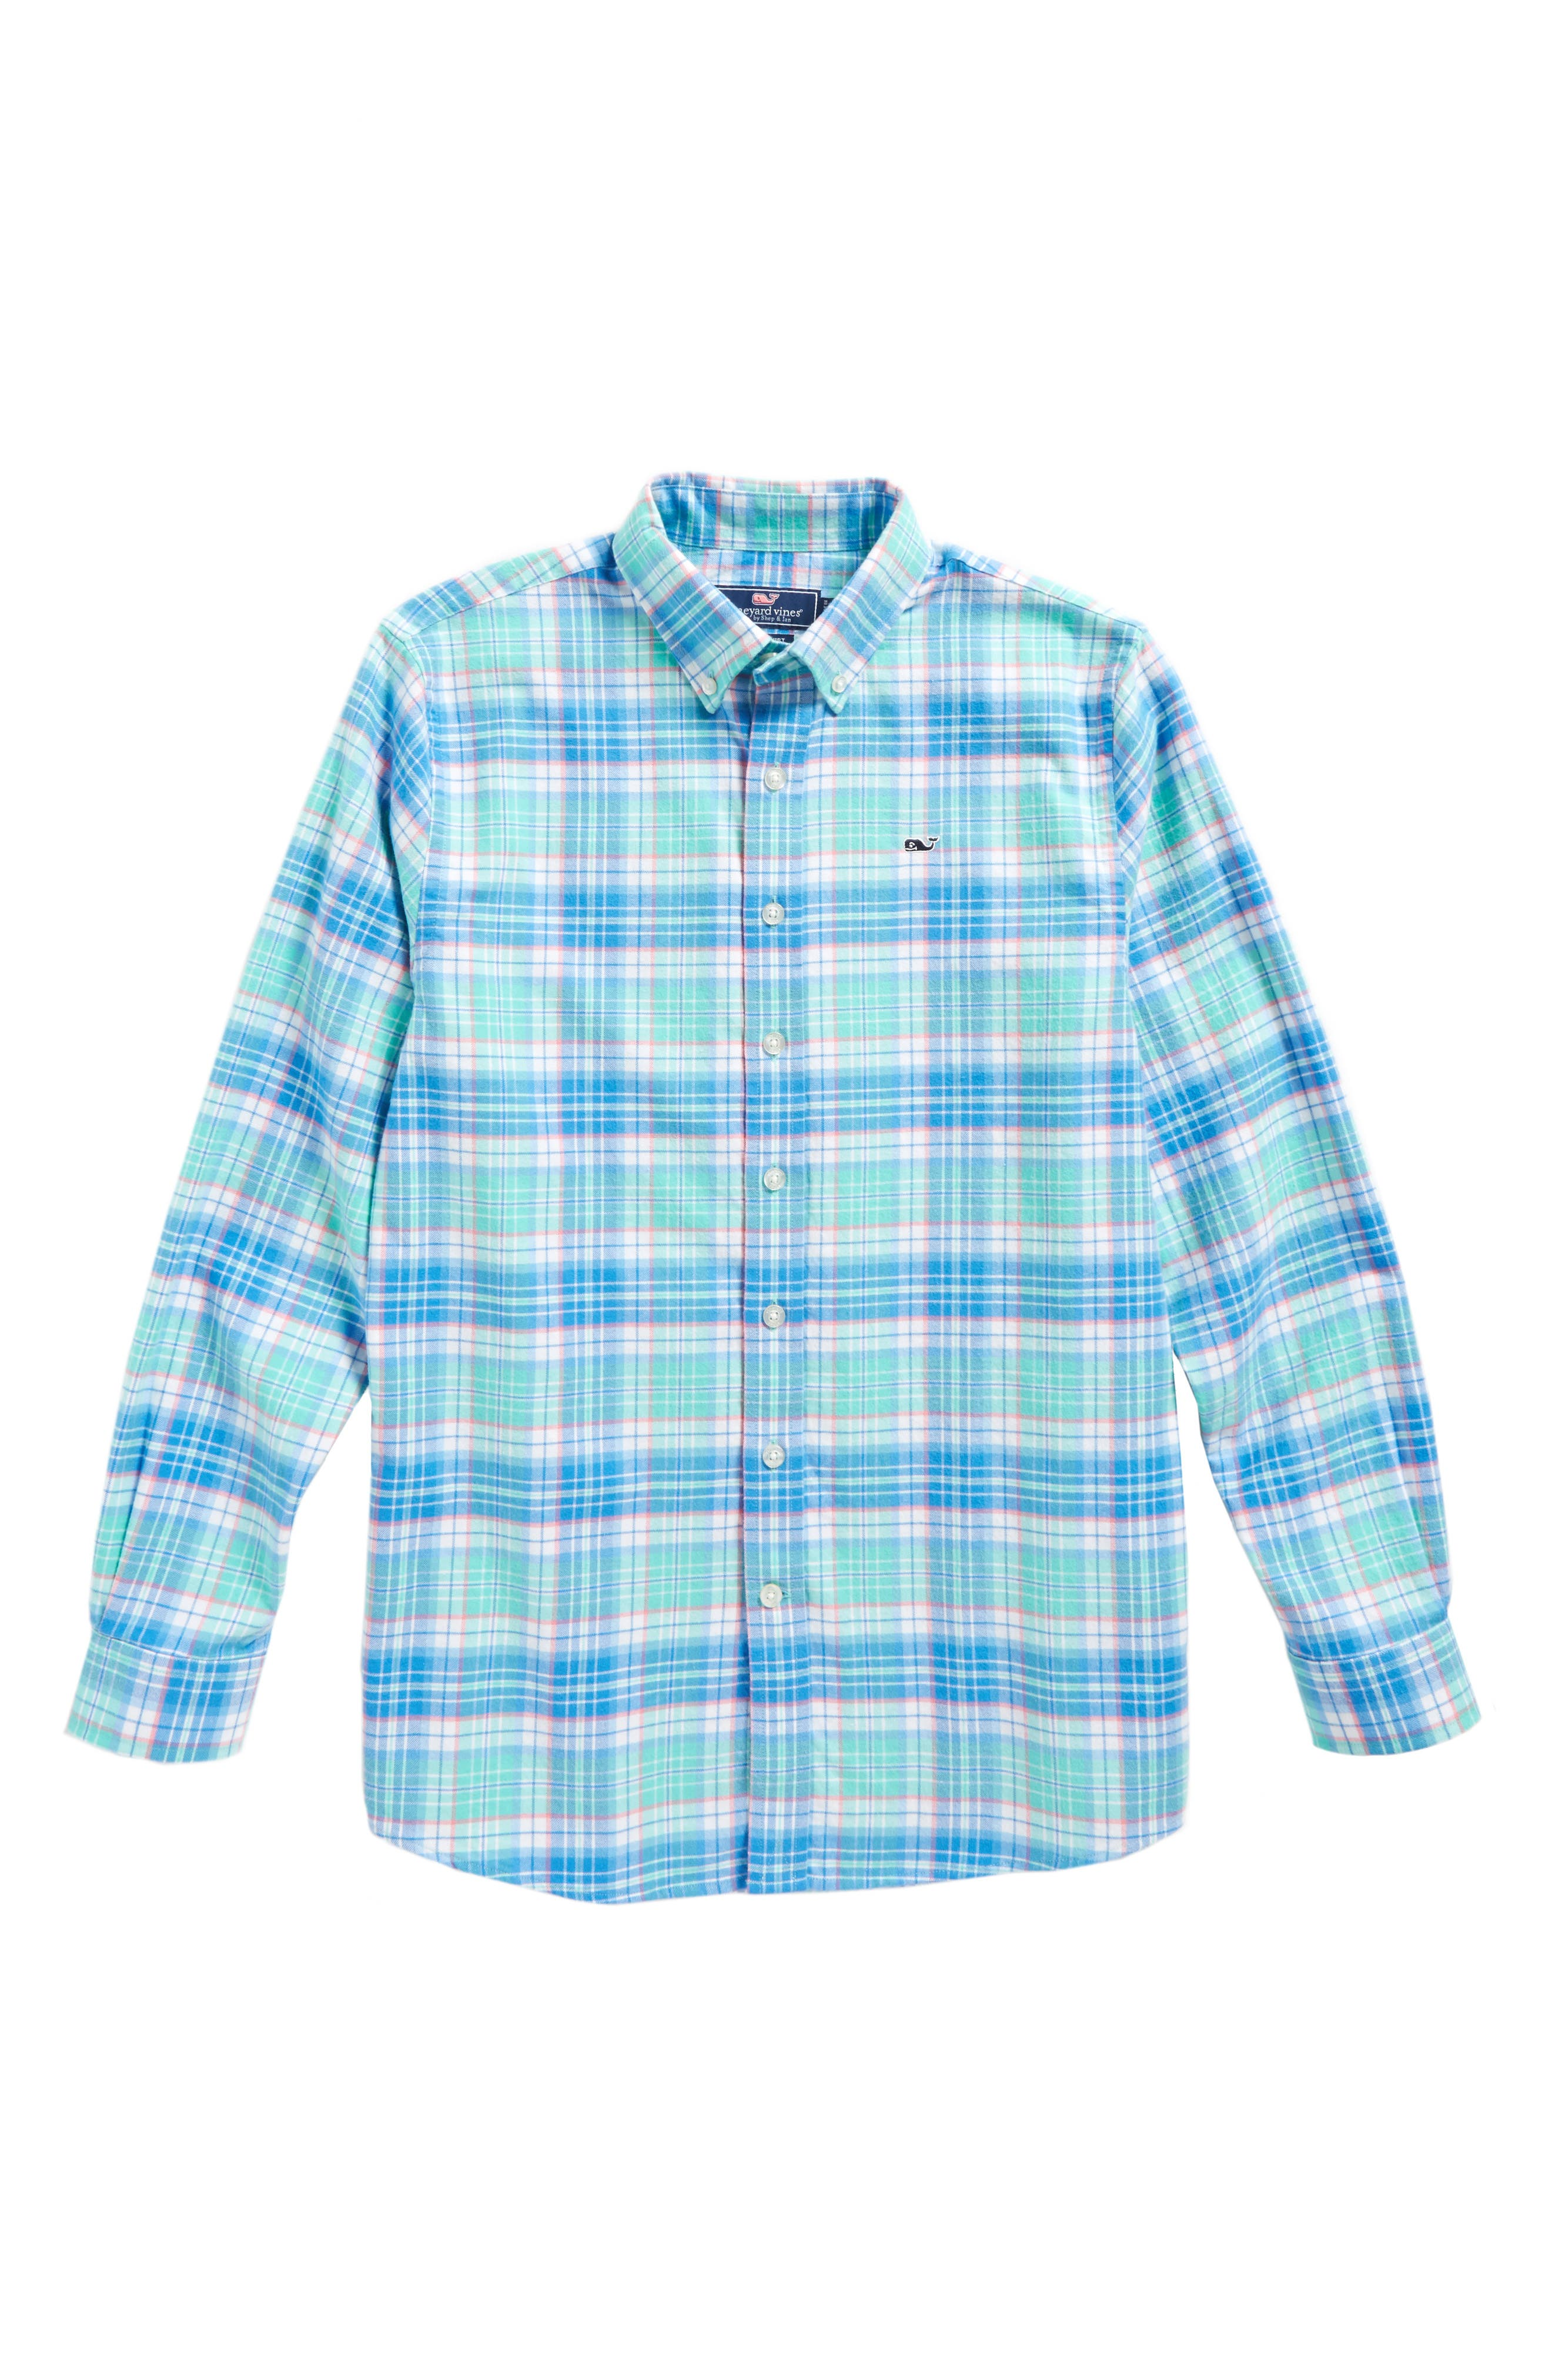 Main Image - vineyard vines Sandspar Plaid Whale Flannel Shirt (Big Boys)